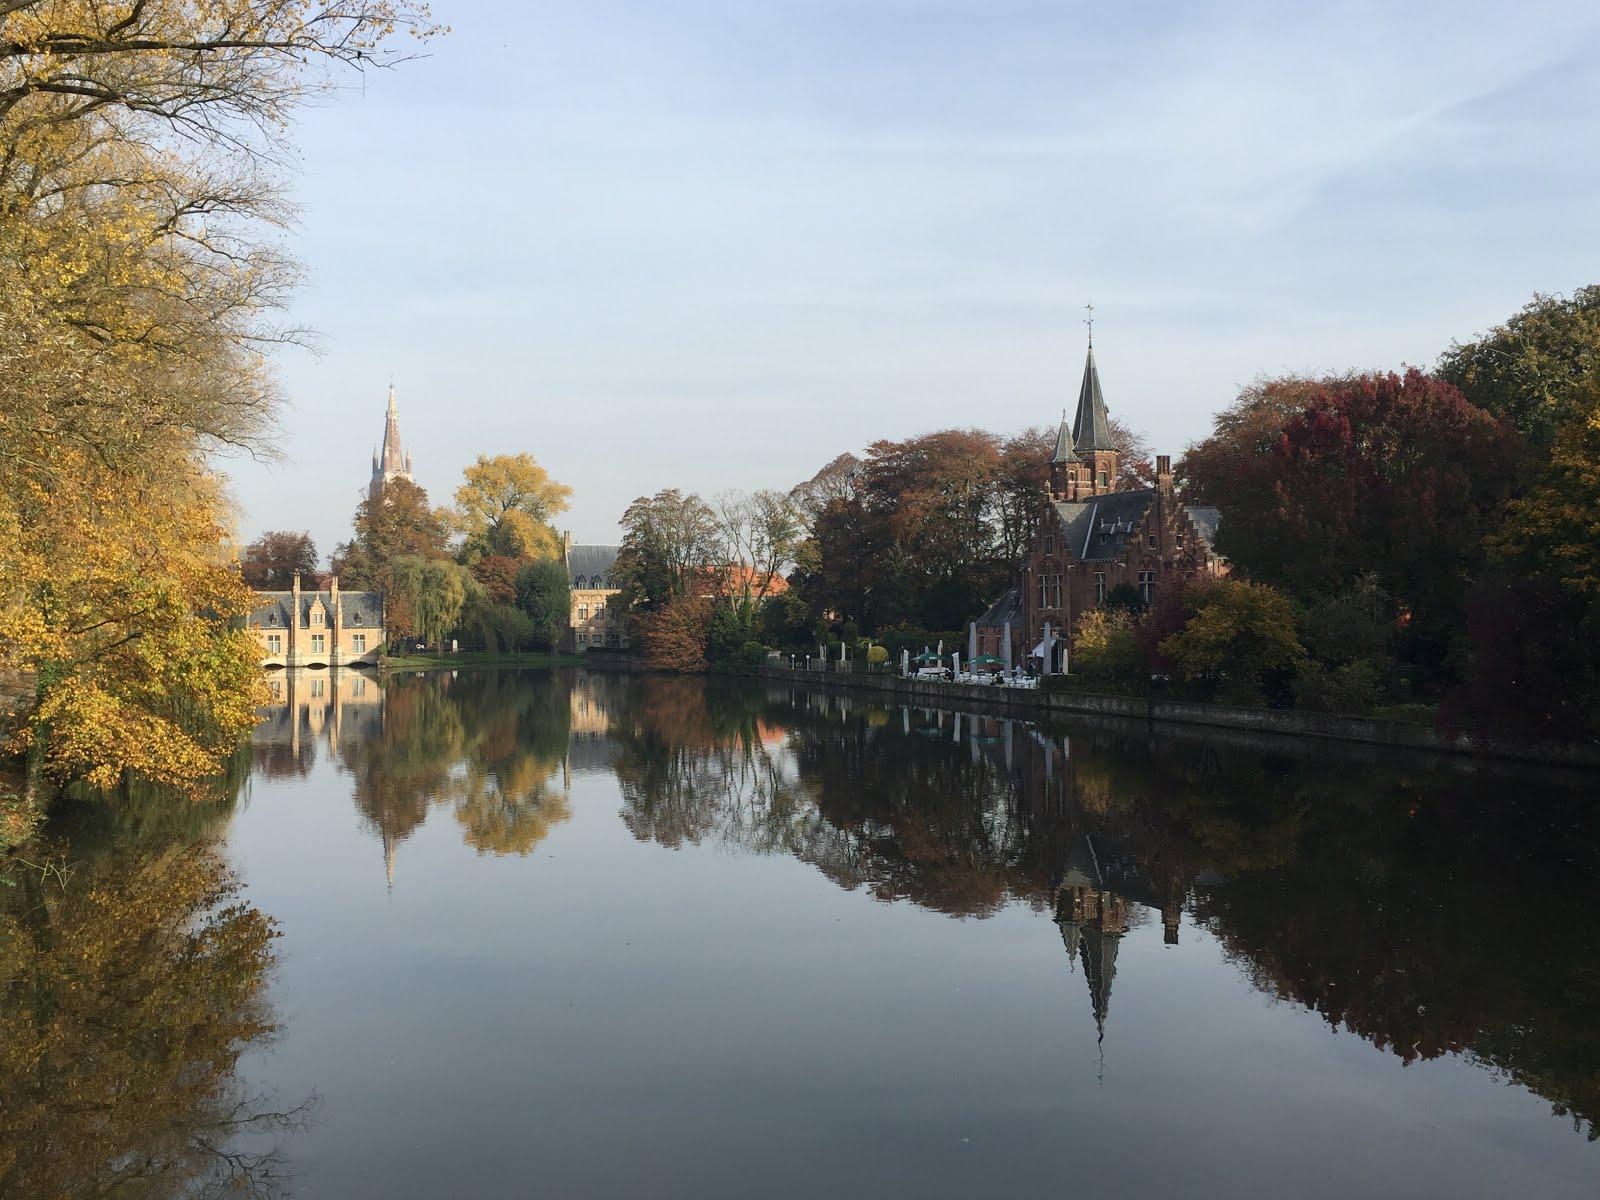 Sashuis - Minnewater, Brugge, Belgium